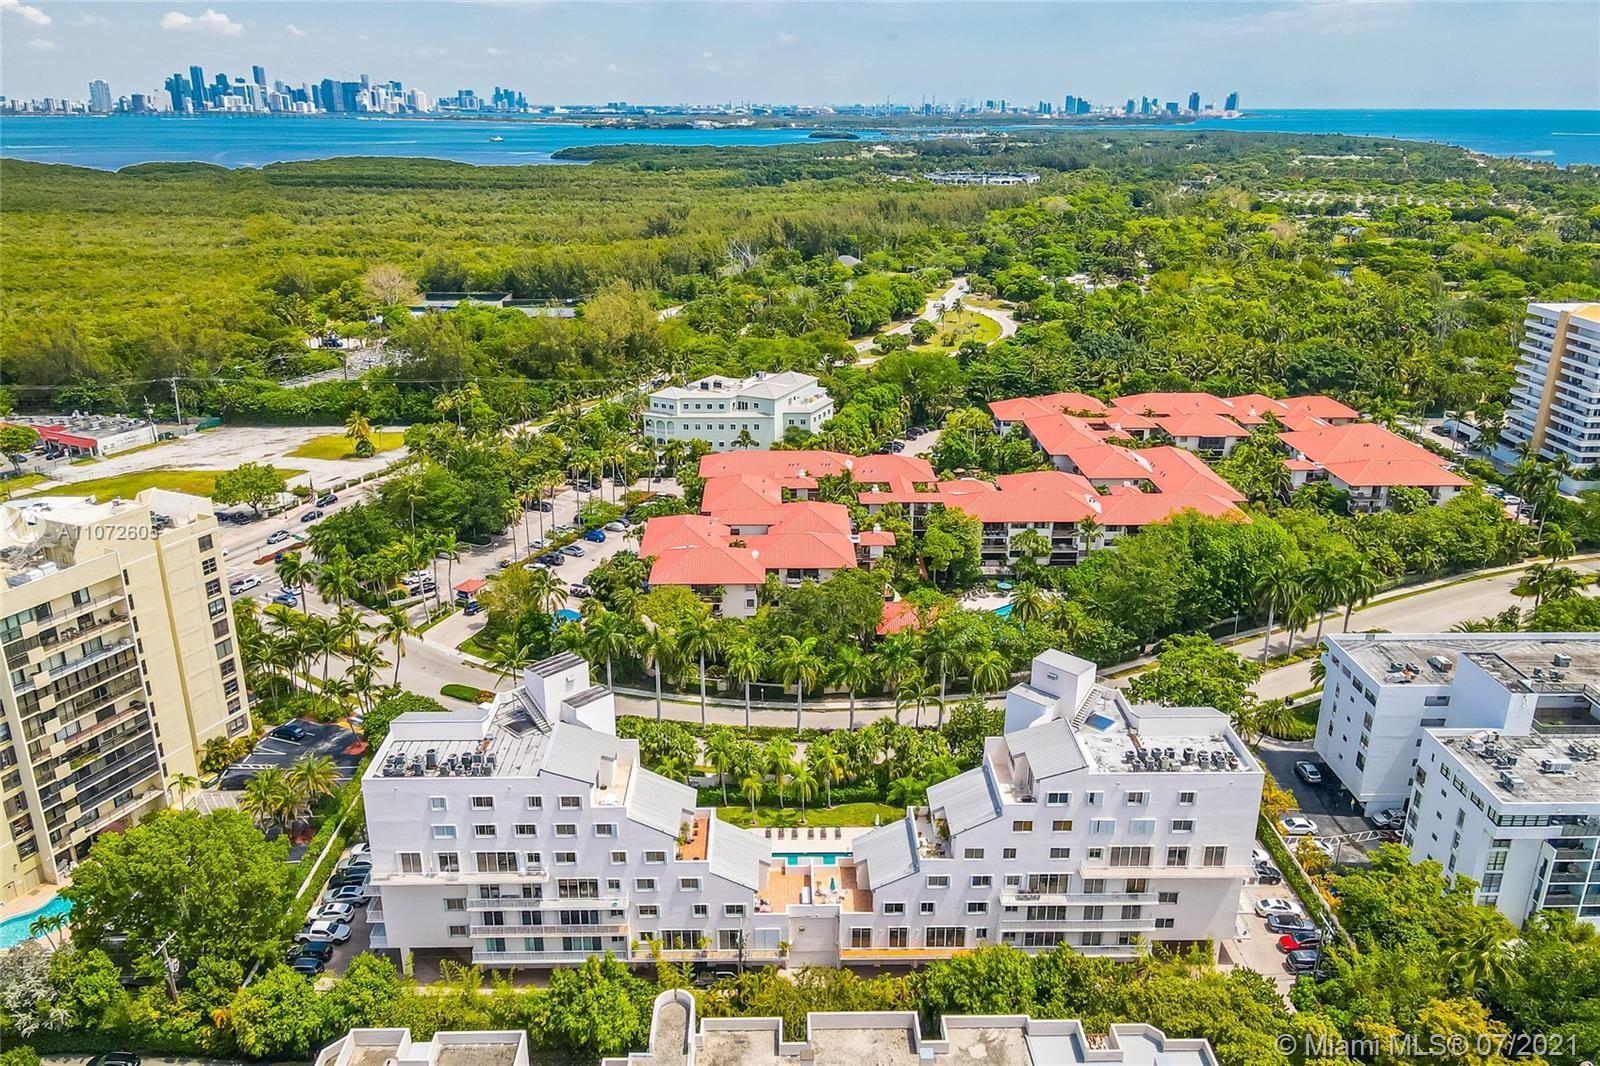 50 Ocean Lane Dr #PH602, Key Biscayne, FL 33149 - #: A11072605